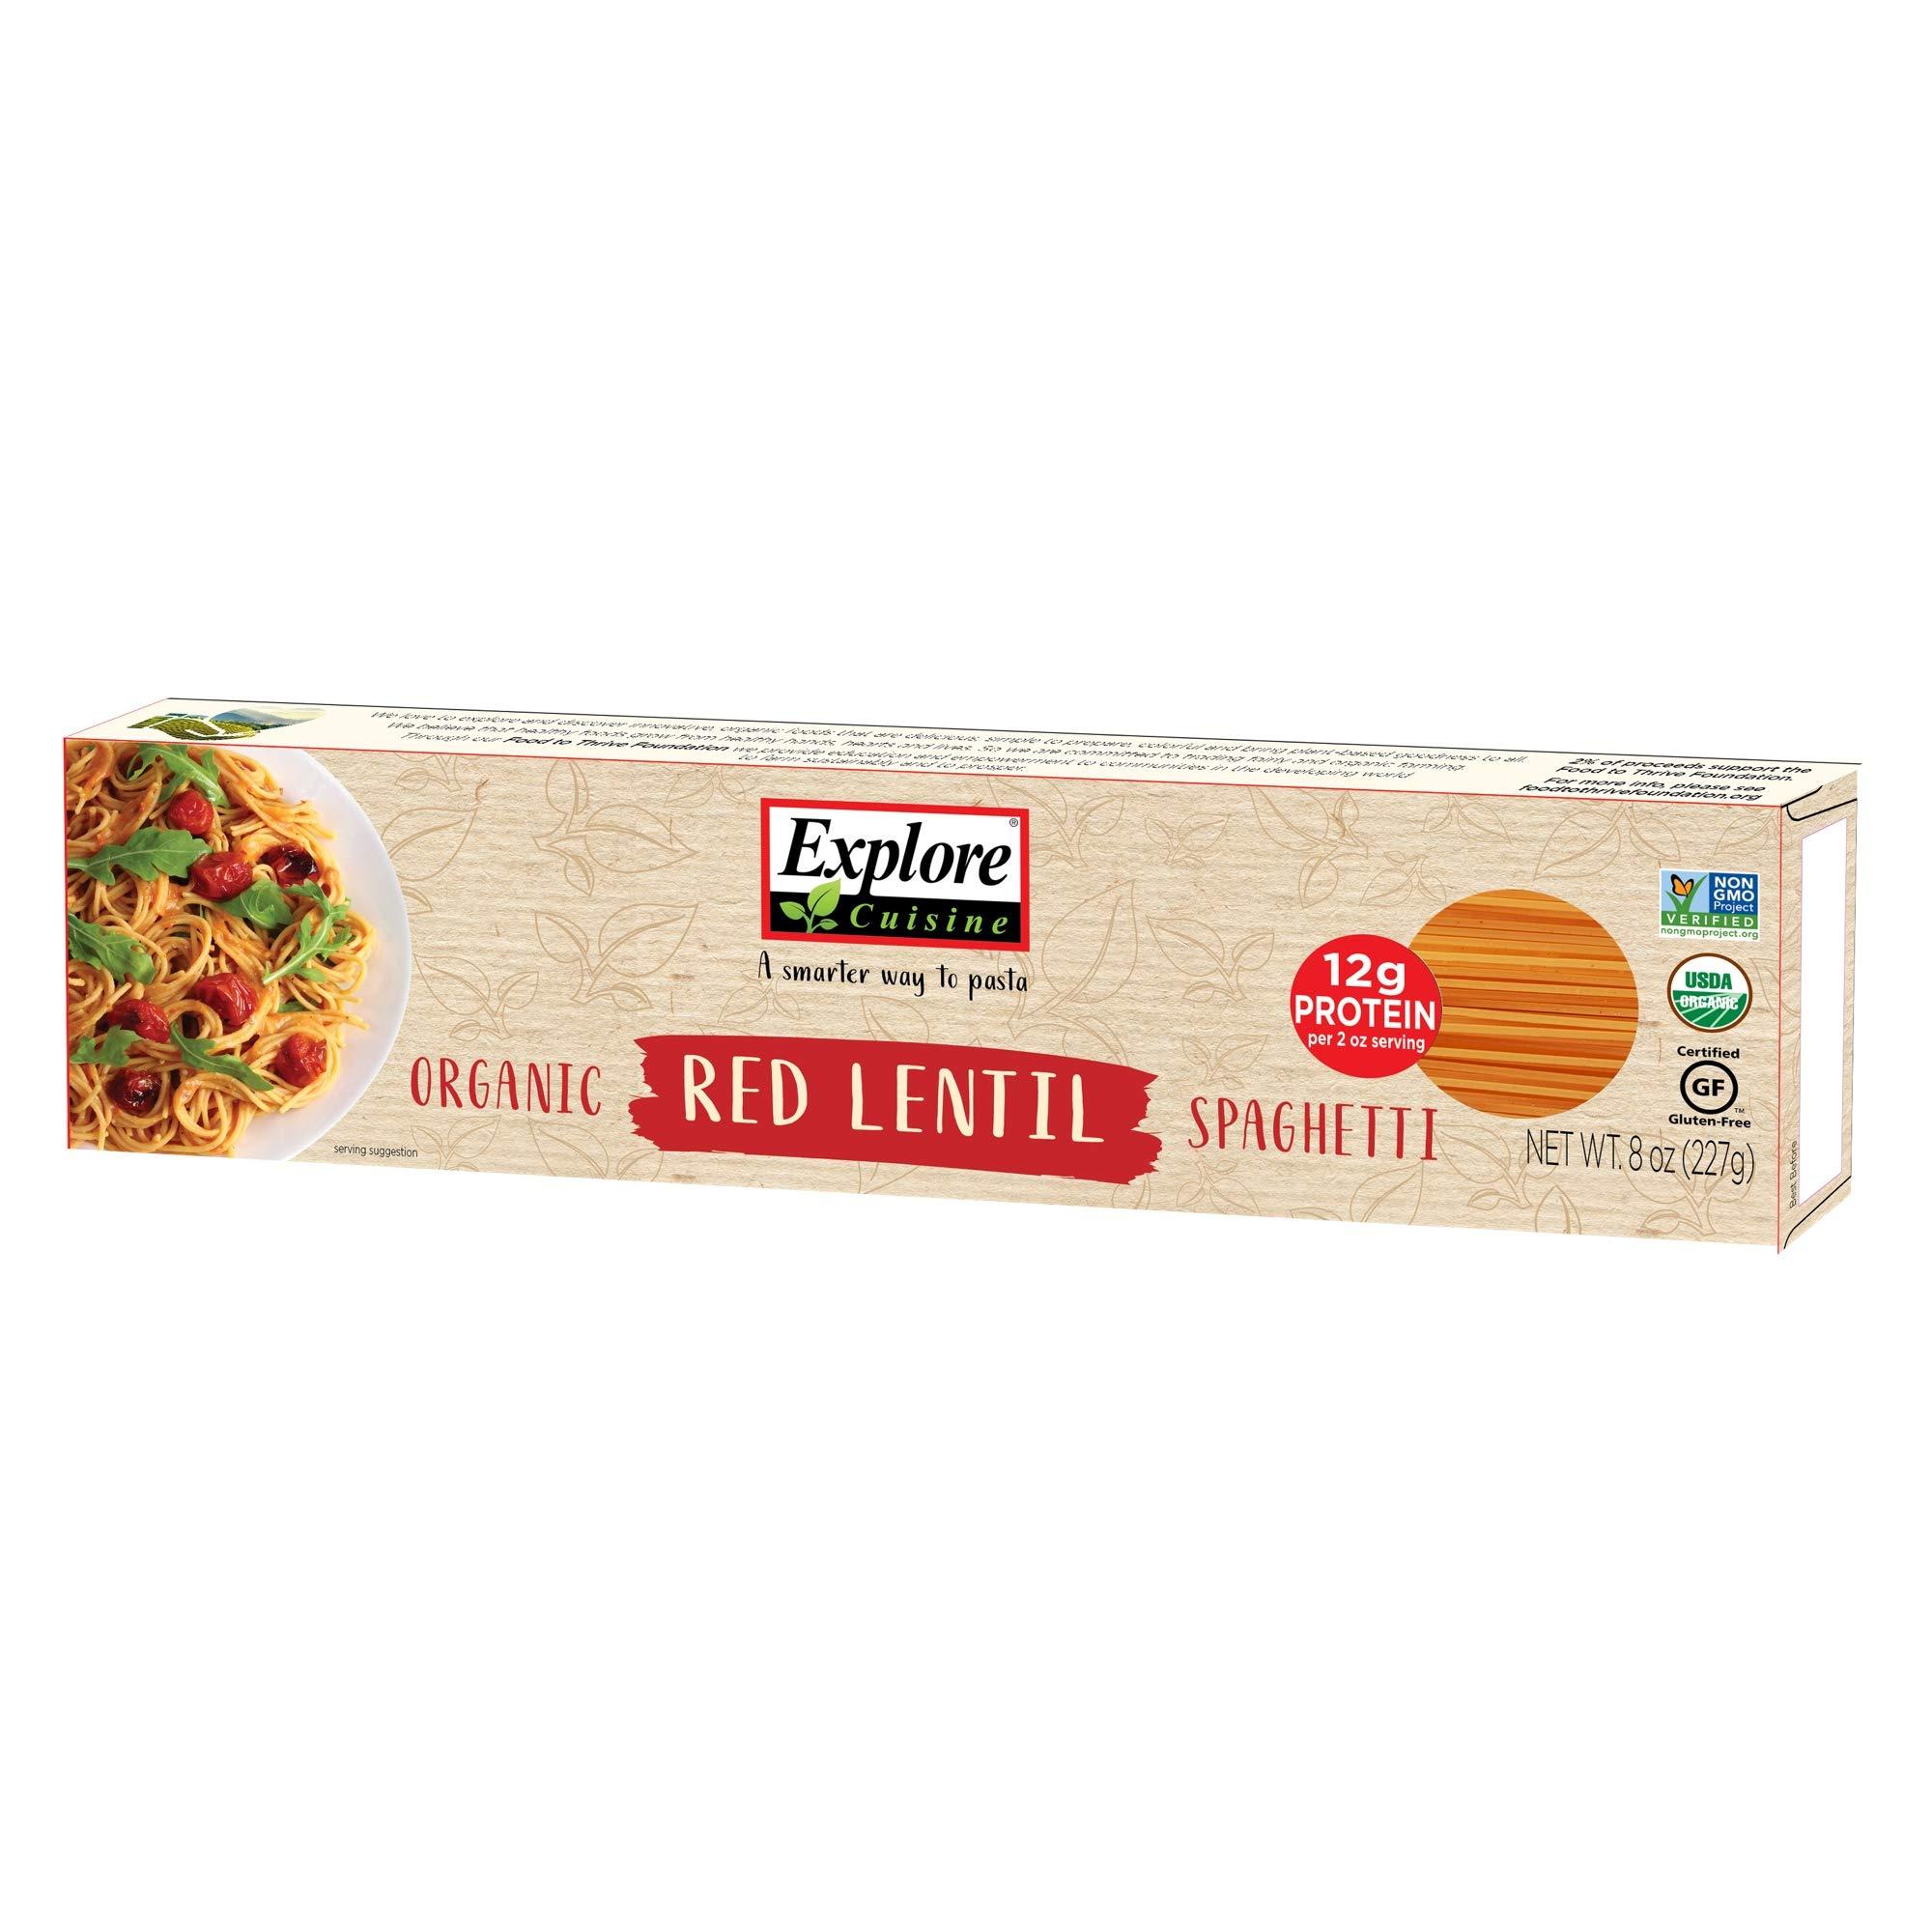 Explore Cuisine Organic Red Lentil Spaghetti - 8 oz -High in Plant-Based Protein, Gluten Free Pasta, Easy to Make - USDA Certified Organic, Vegan, Kosher, Non GMO - 4 Servings by EXPLORE CUISINE